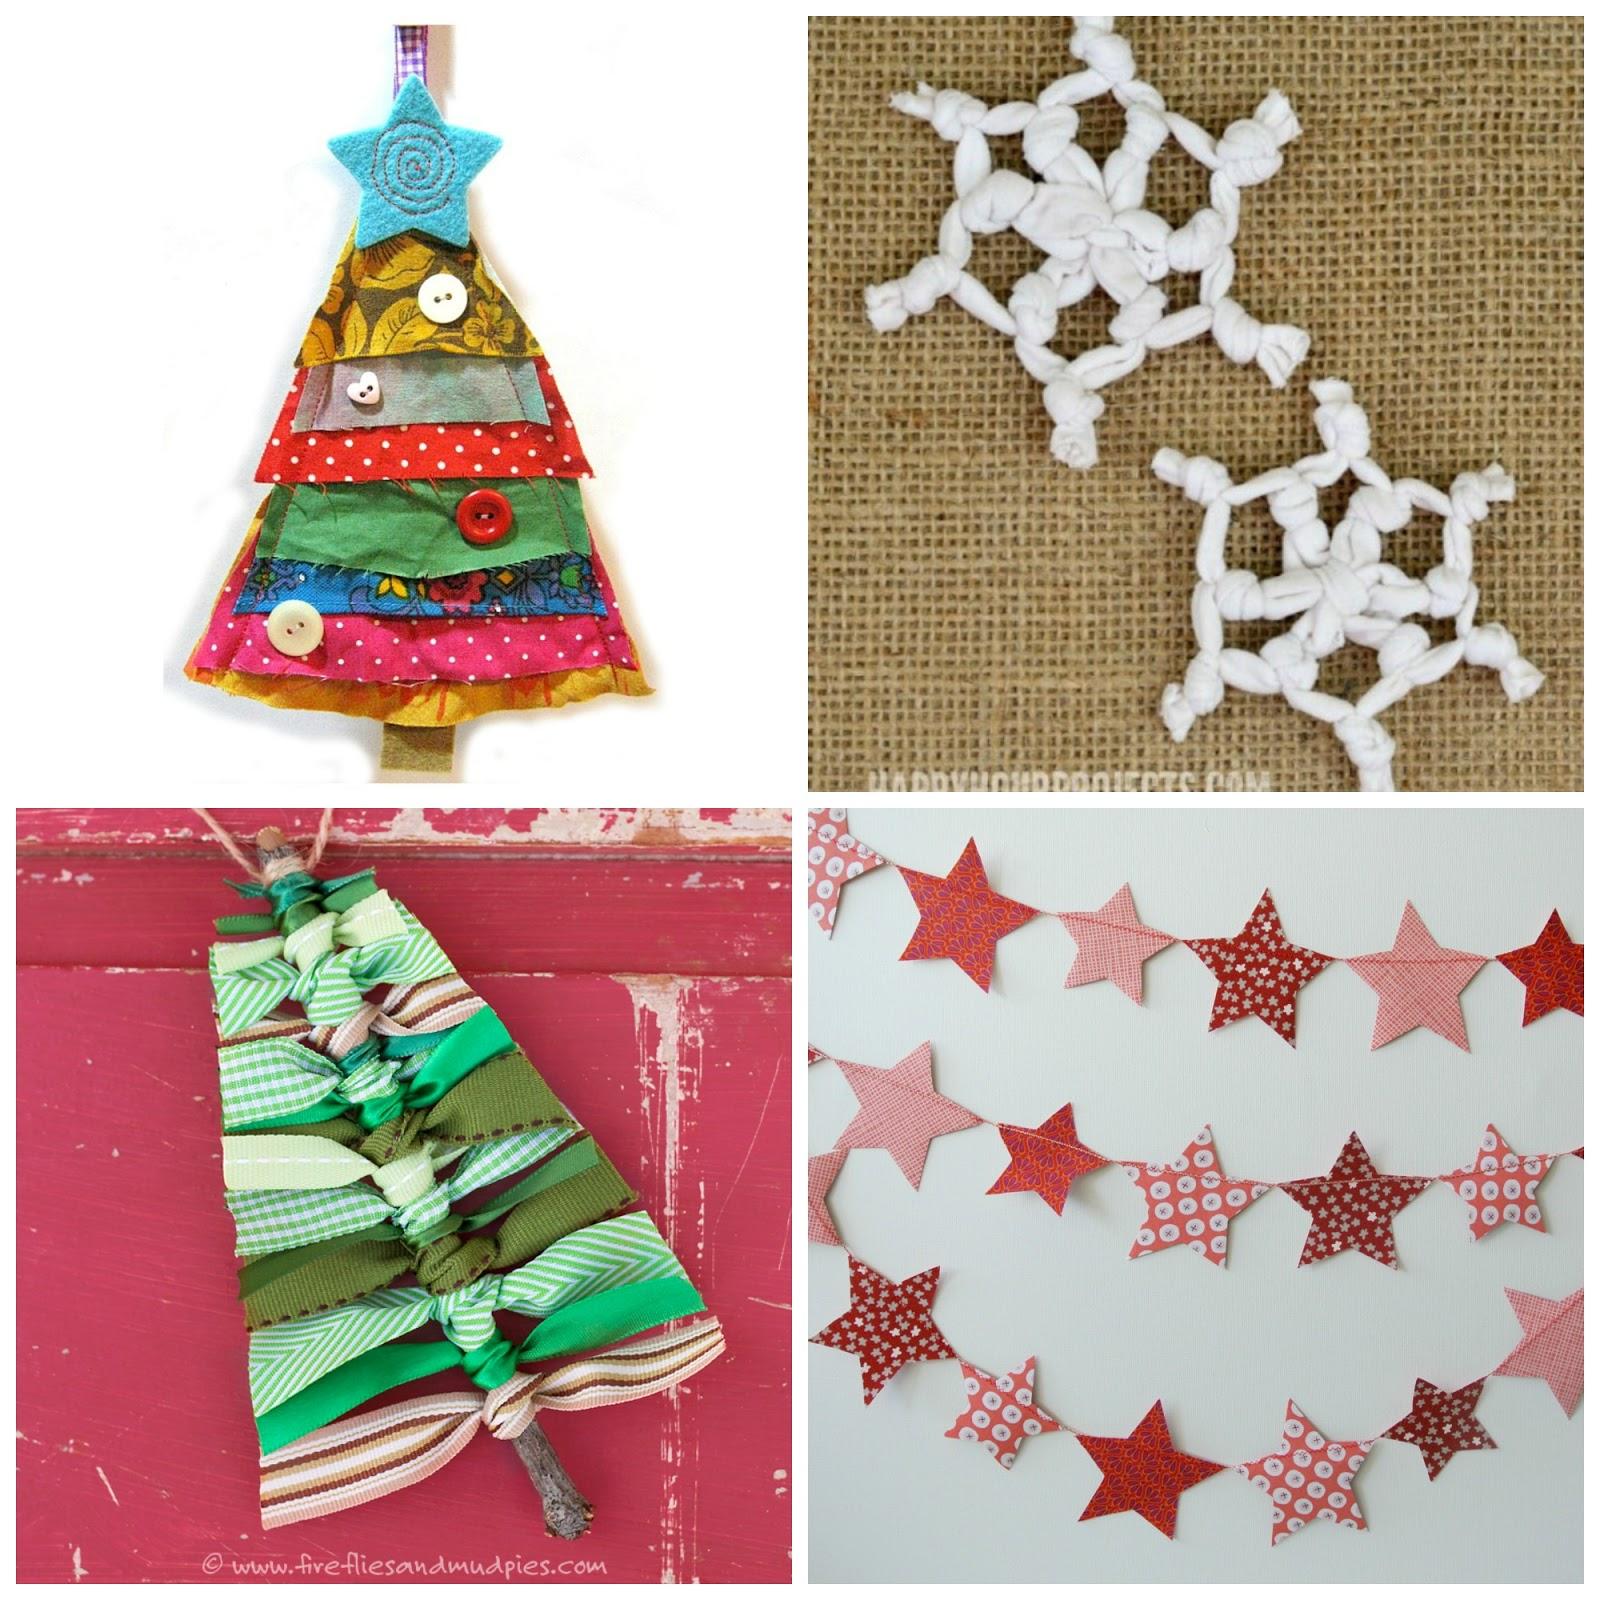 By Miekk Vier Restjes Ideeën Voor Kerst